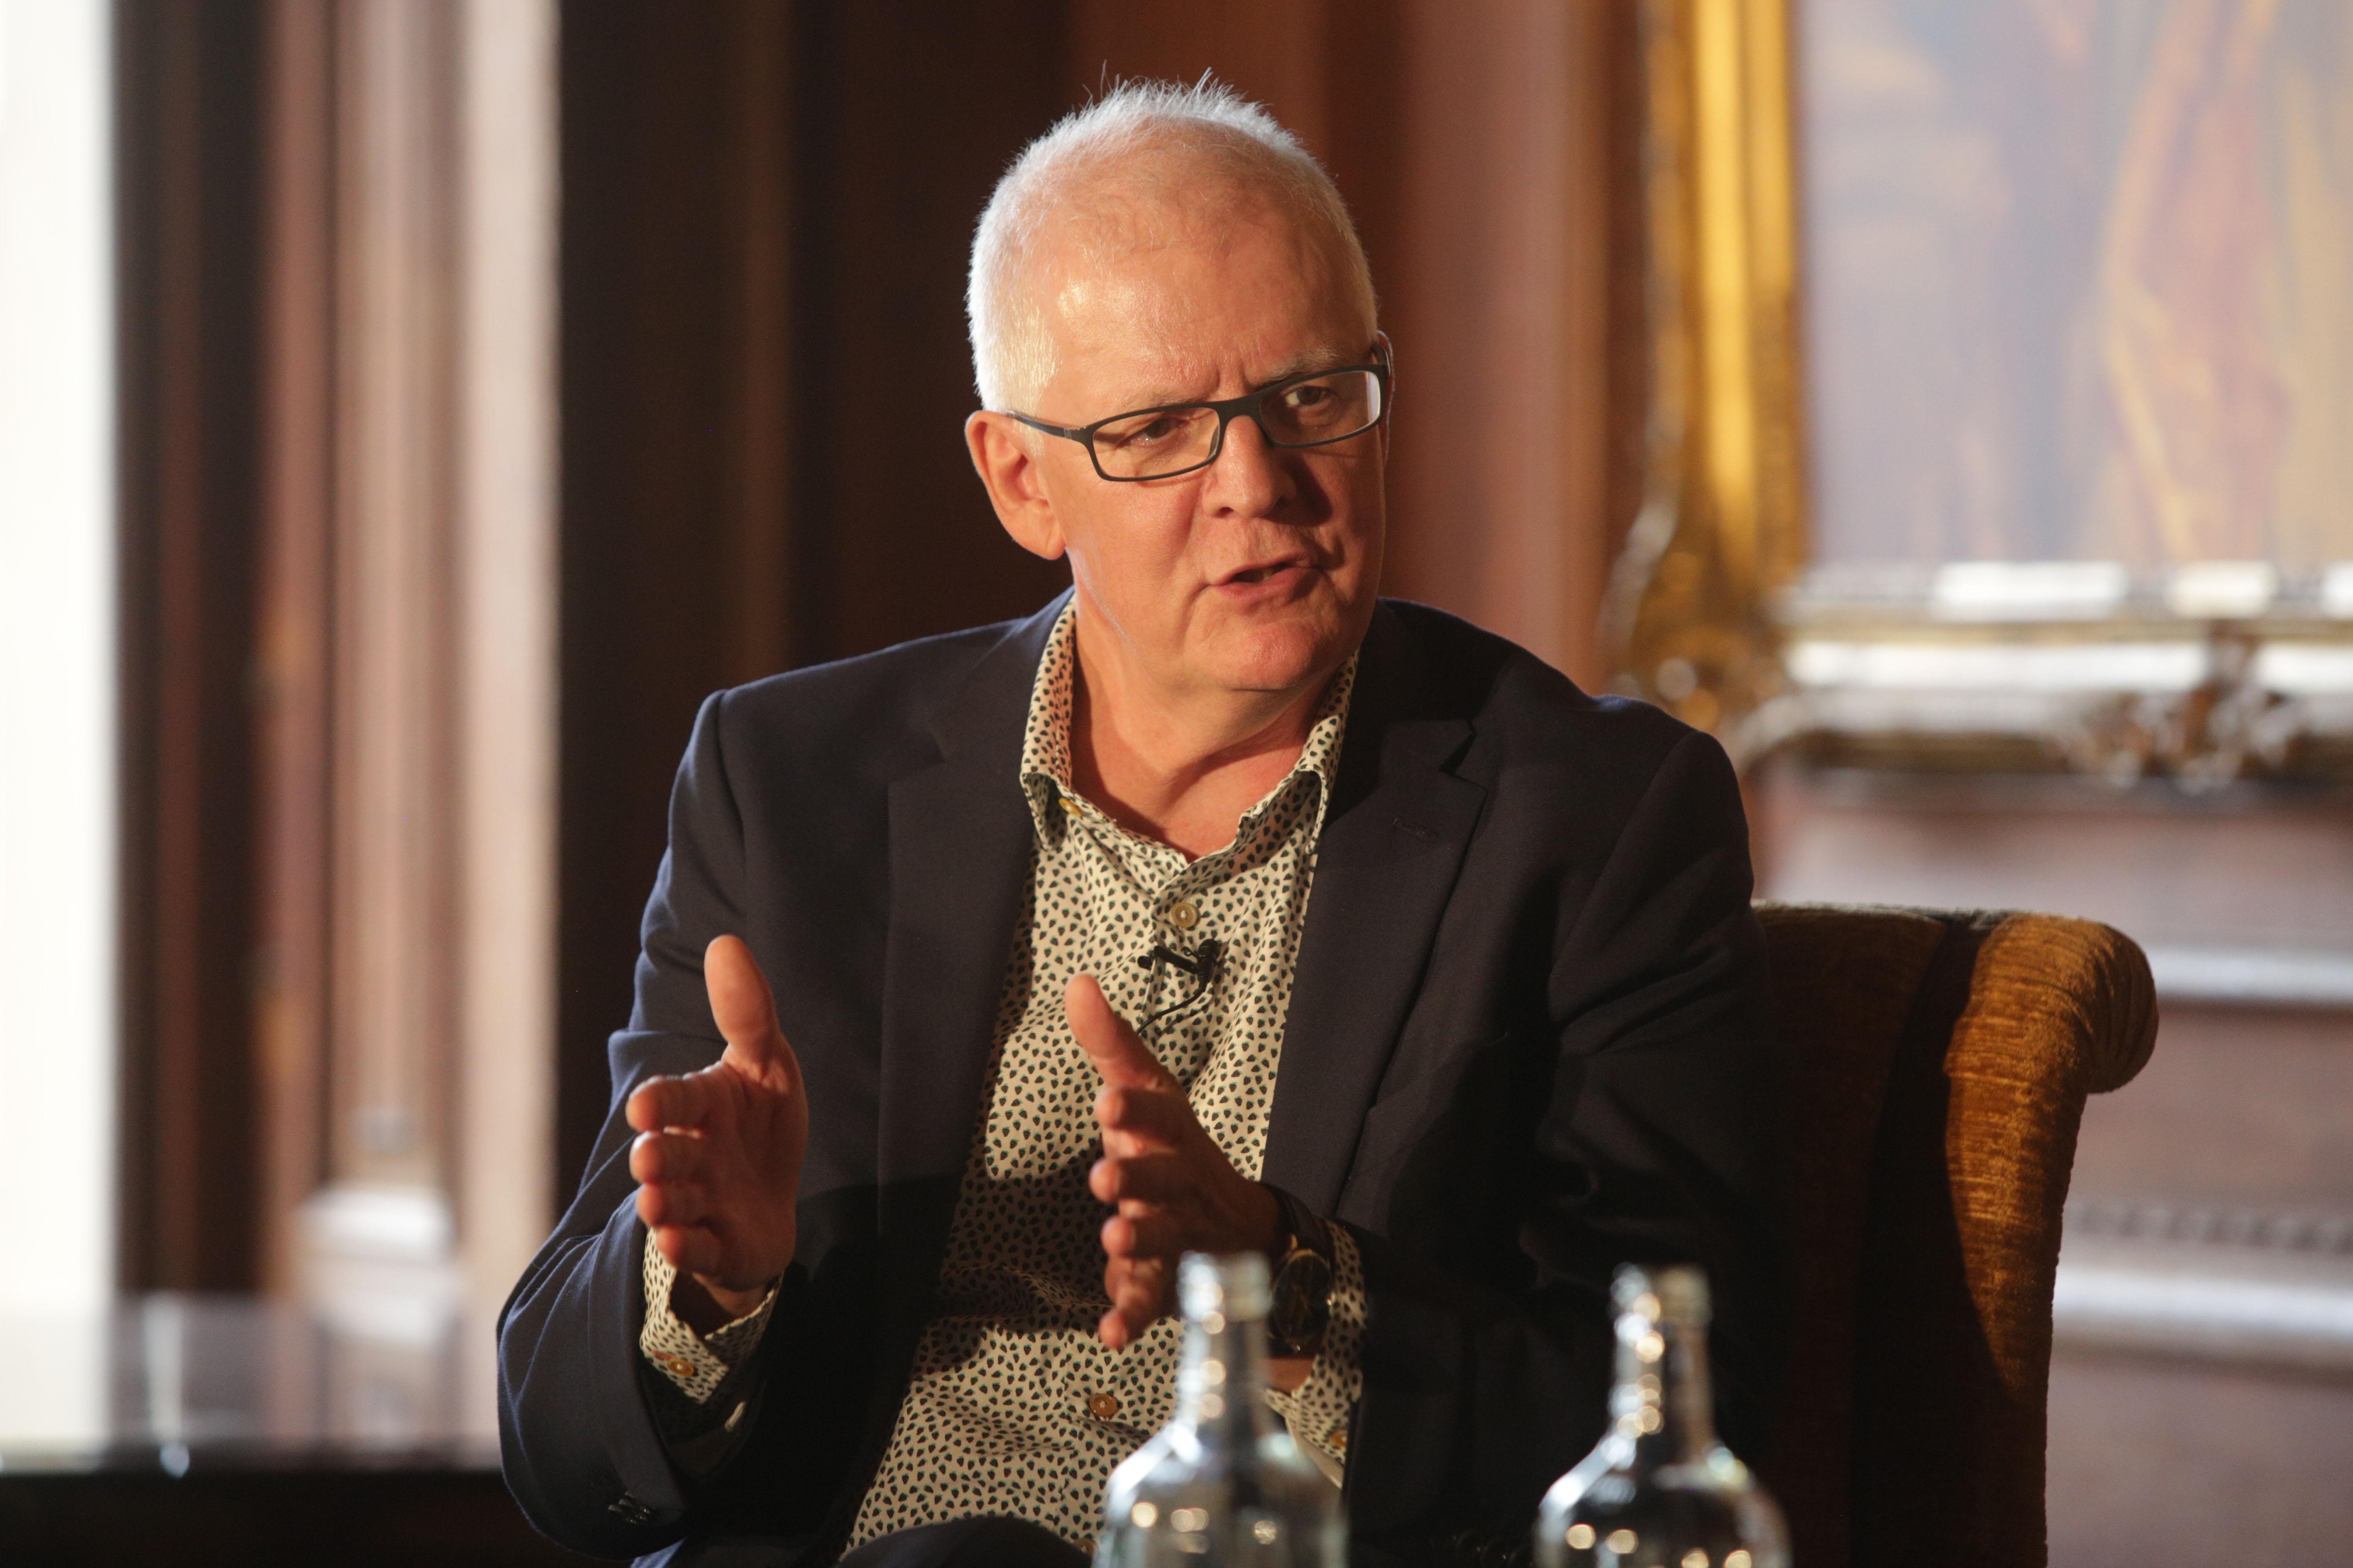 Ken Shuttleworth at Cliveden Literary Festival